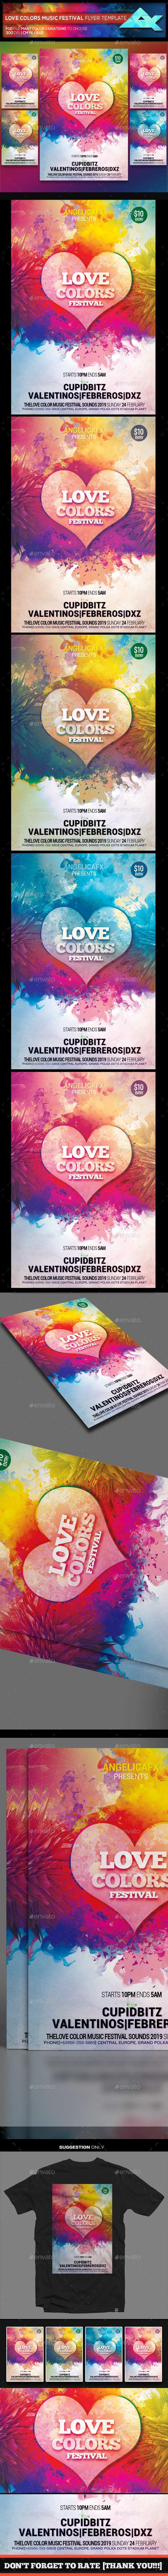 Love Colors Music Festival Flyer Template  Color Music Flyer